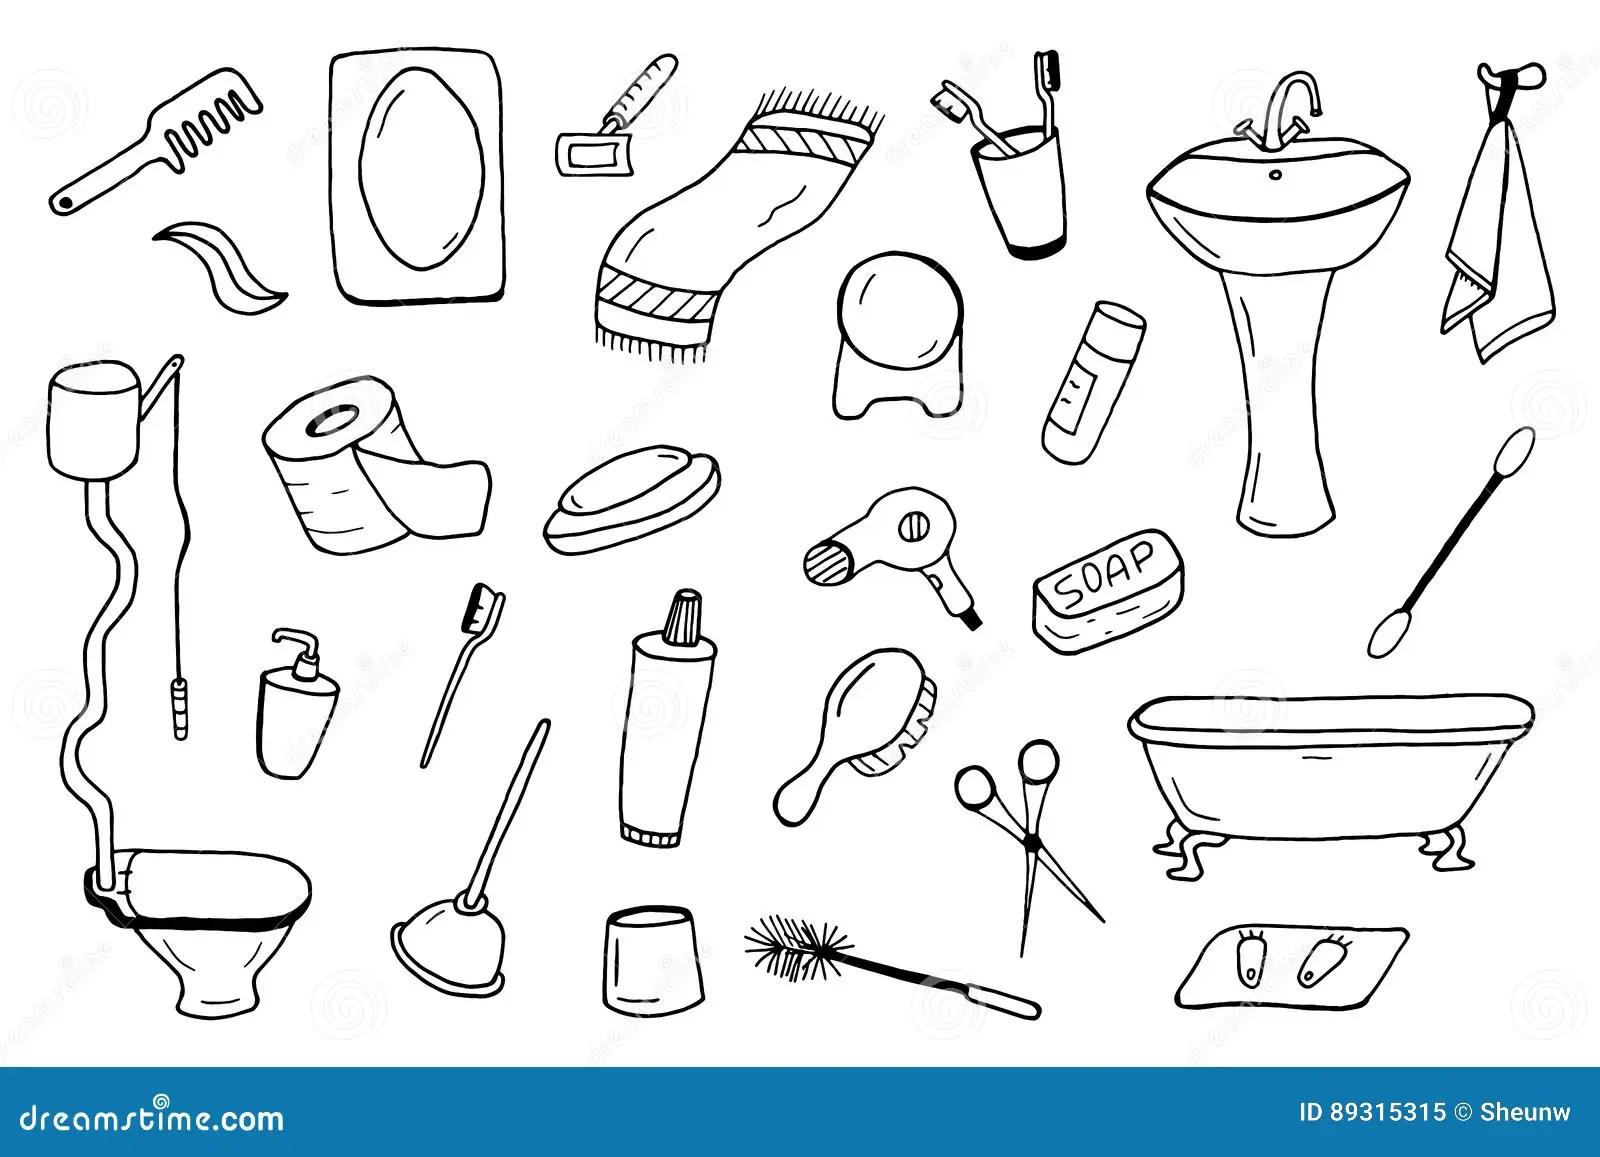 Bathtime Cartoons Illustrations Amp Vector Stock Images